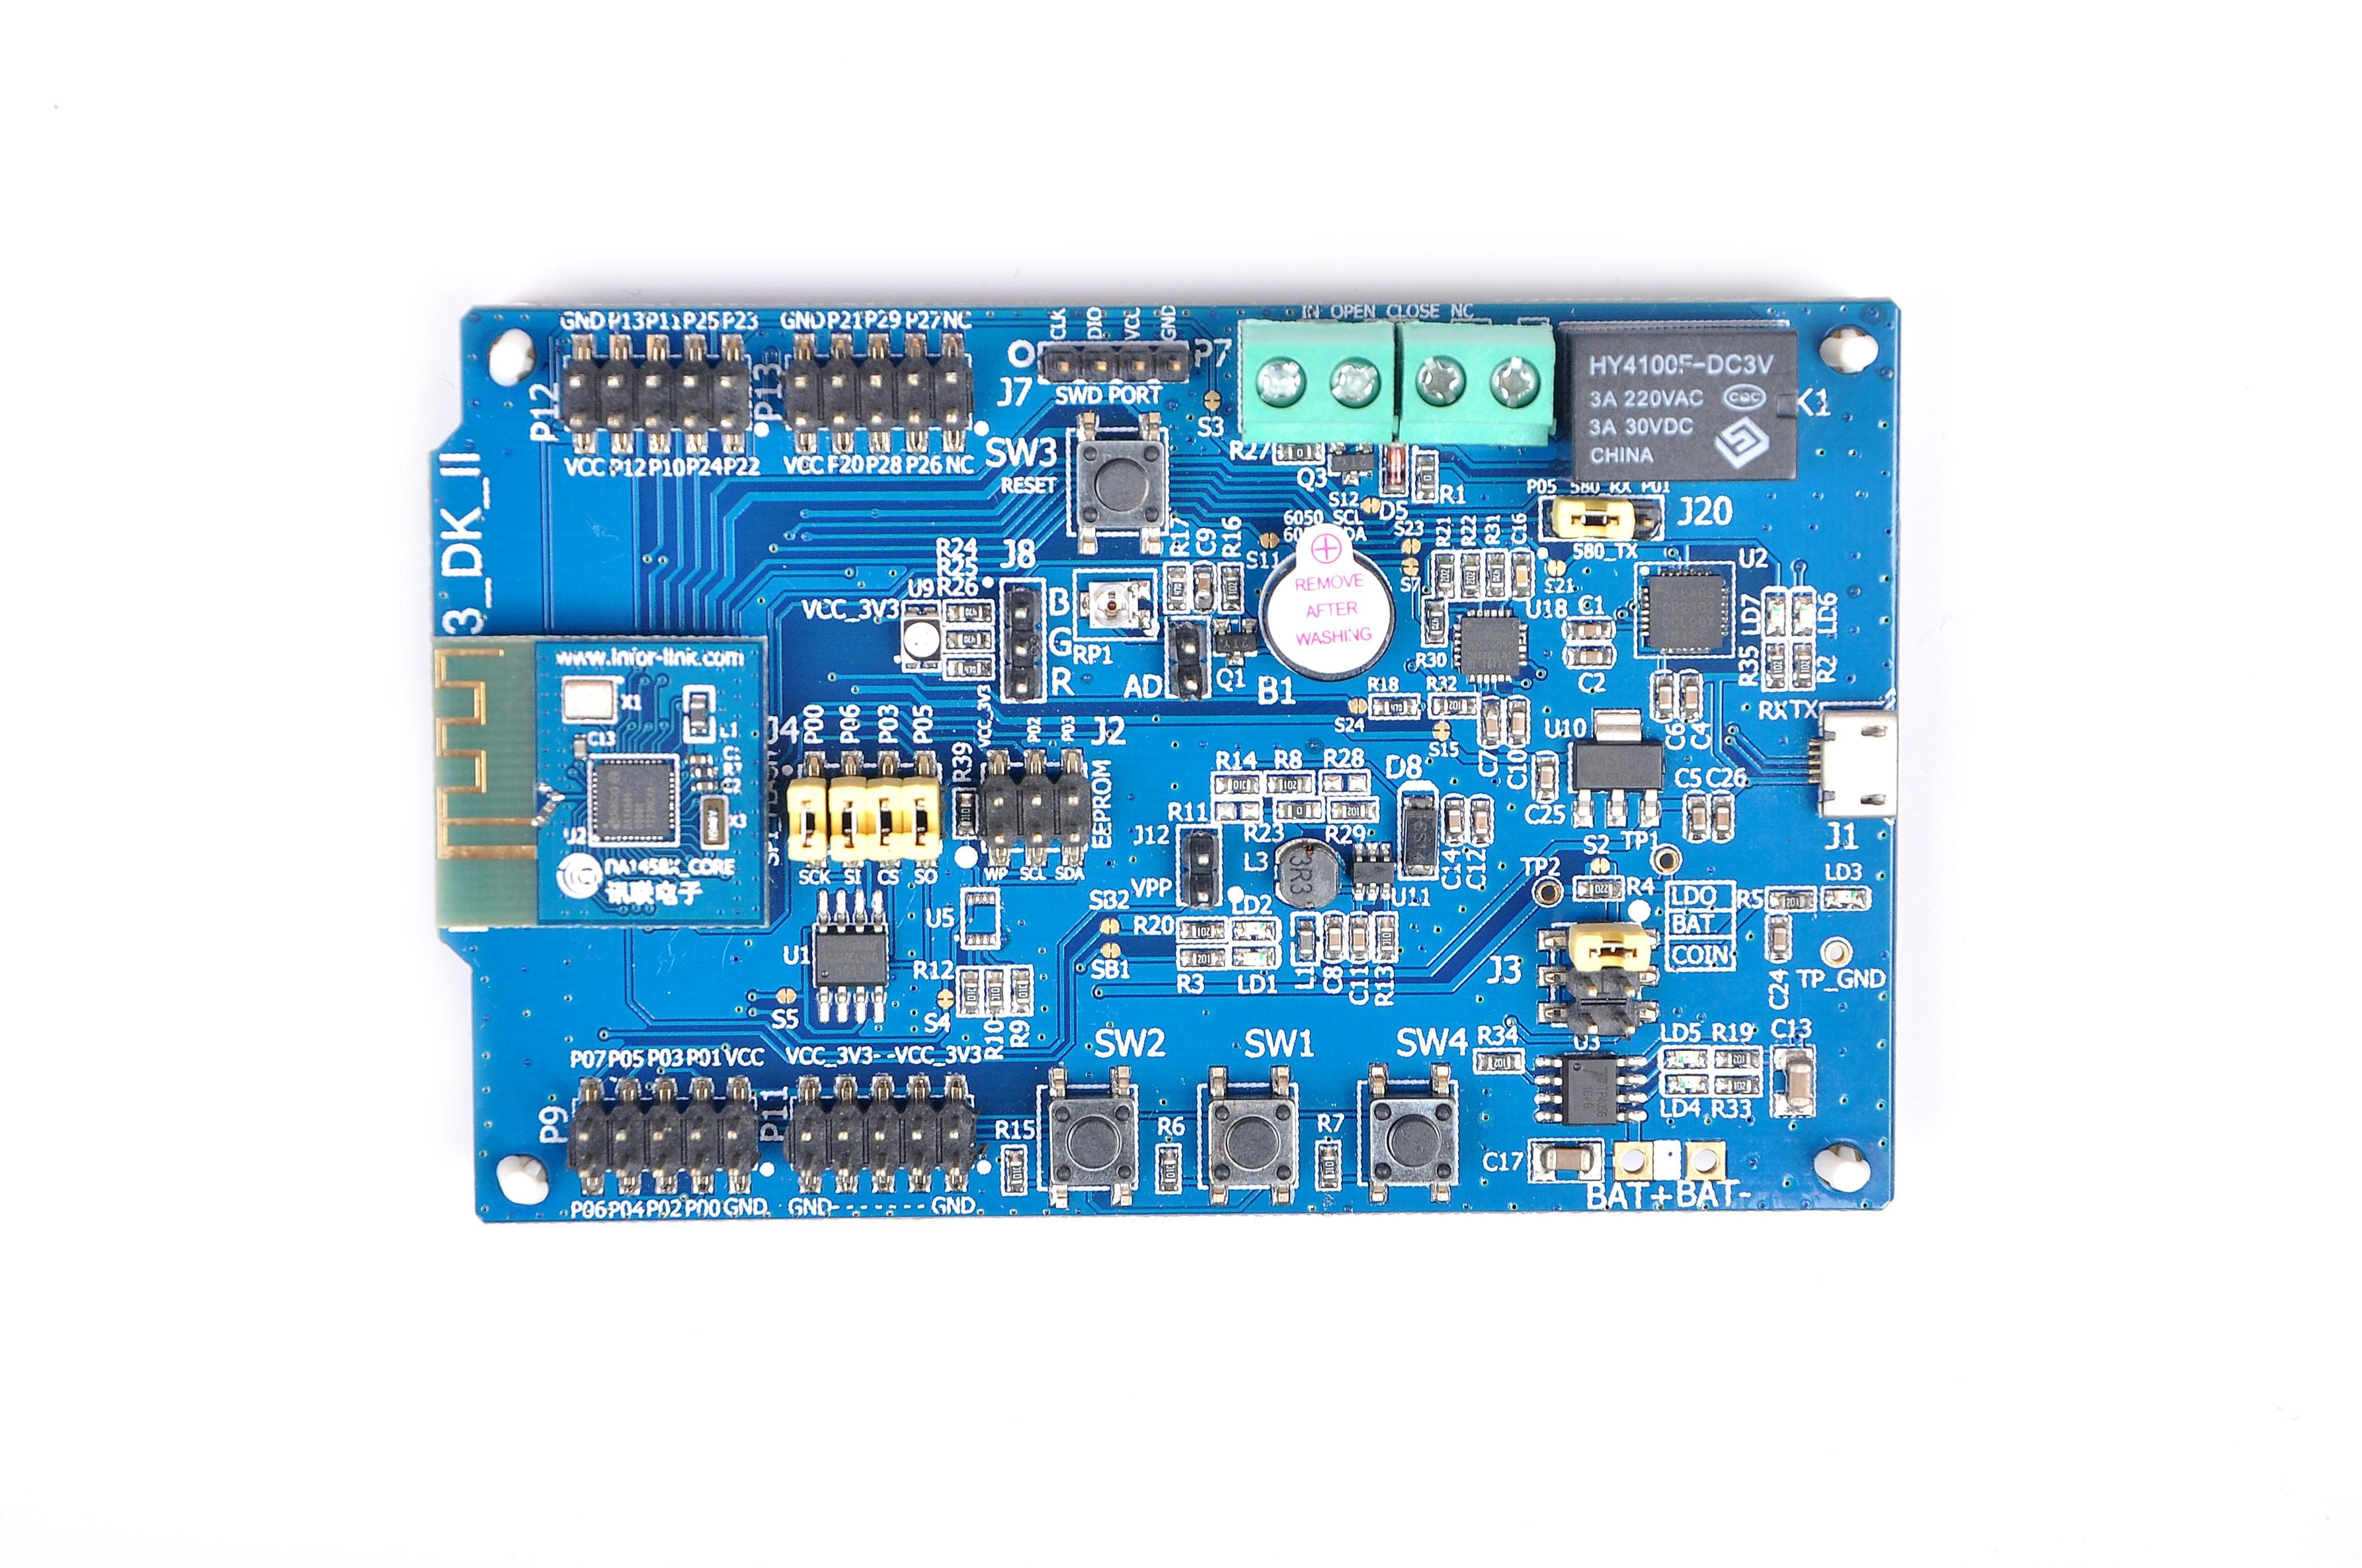 First Episode! Bluetooth 5 Bluetooth 4.0BLE DIALOG DA14580 Optimized Version of DA14585 Development Board hot da14580 ak bluetooth ble development board ibeacon millet bracelet lis3dh power industry